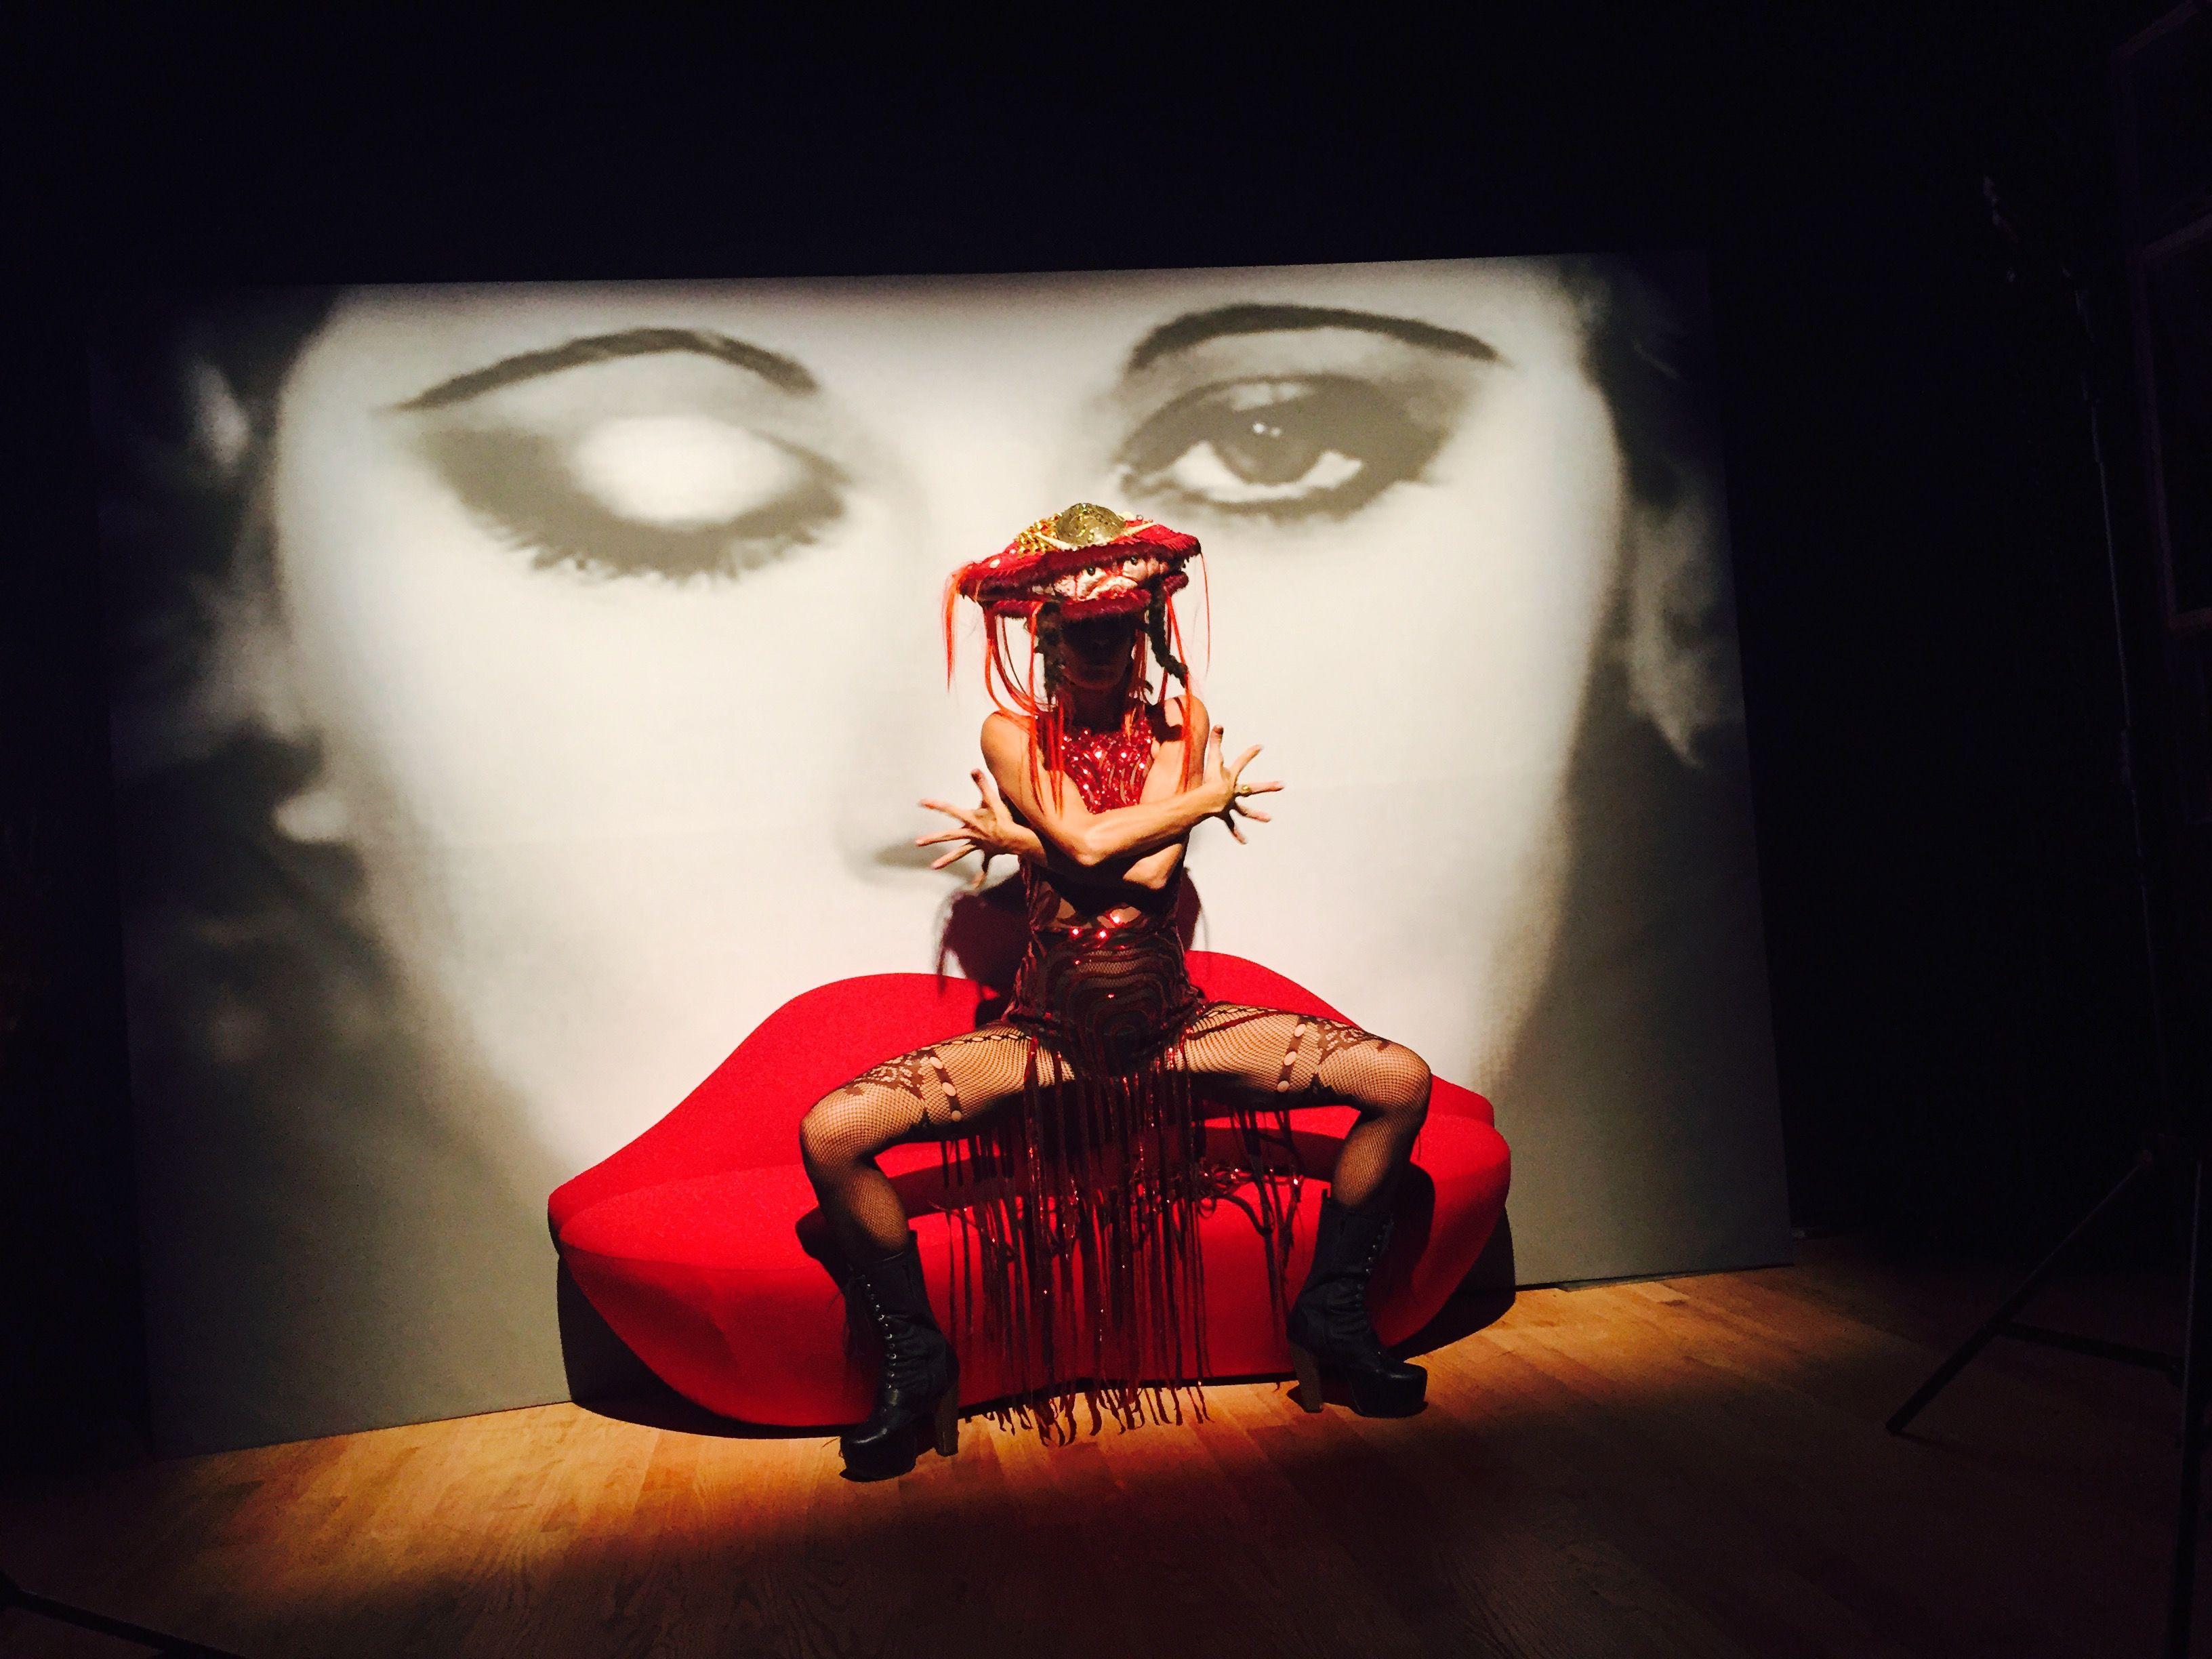 #surrealism #salvadordali #lobster #schiaparelli #costume #headpiece #circus #ambiance #lucentdossier #lucentdossierexperience #evententertainment